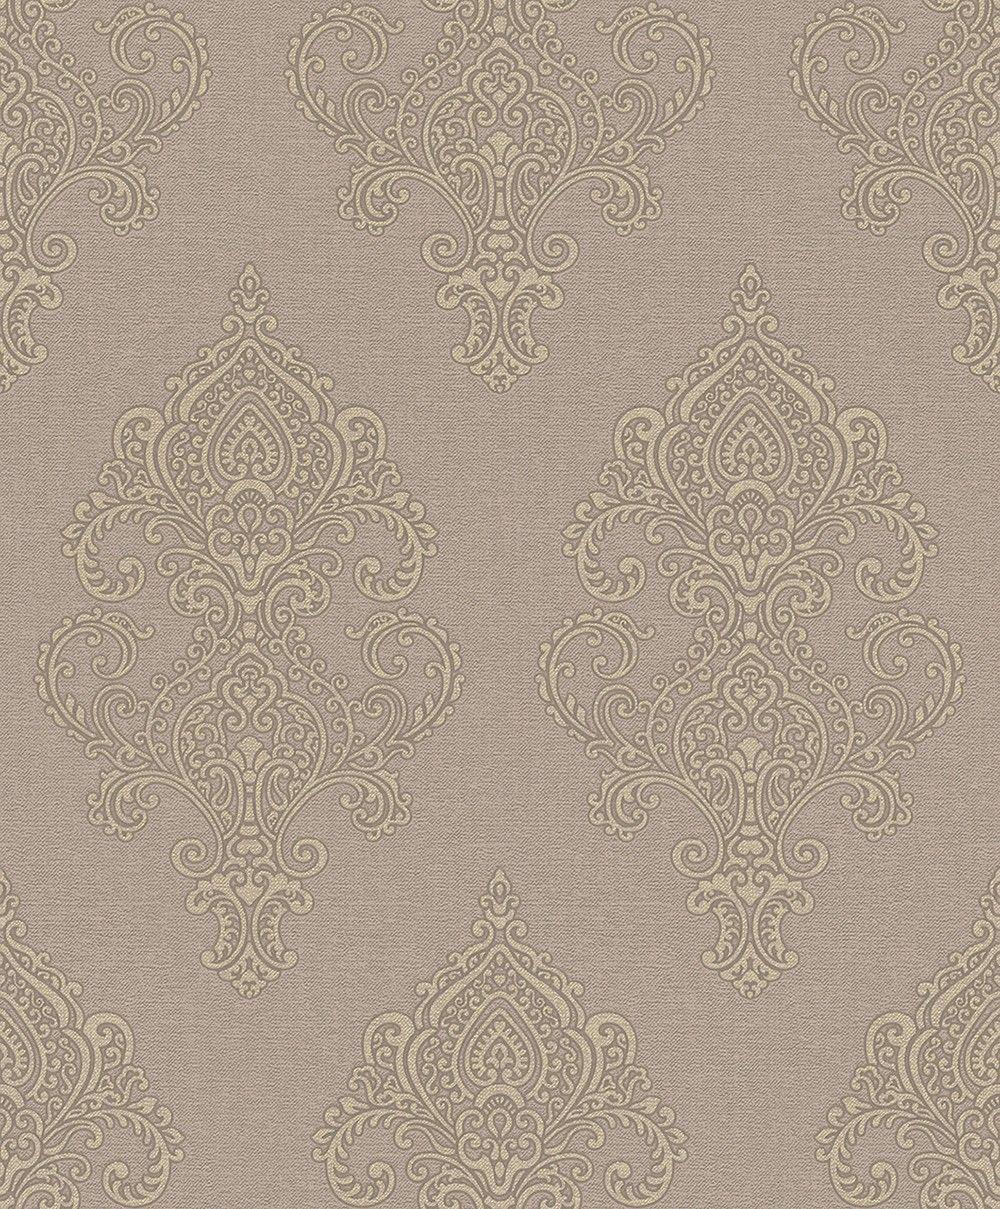 Tapete Carlotta 02 Ornament Tapete Tapeten Rasch Textil